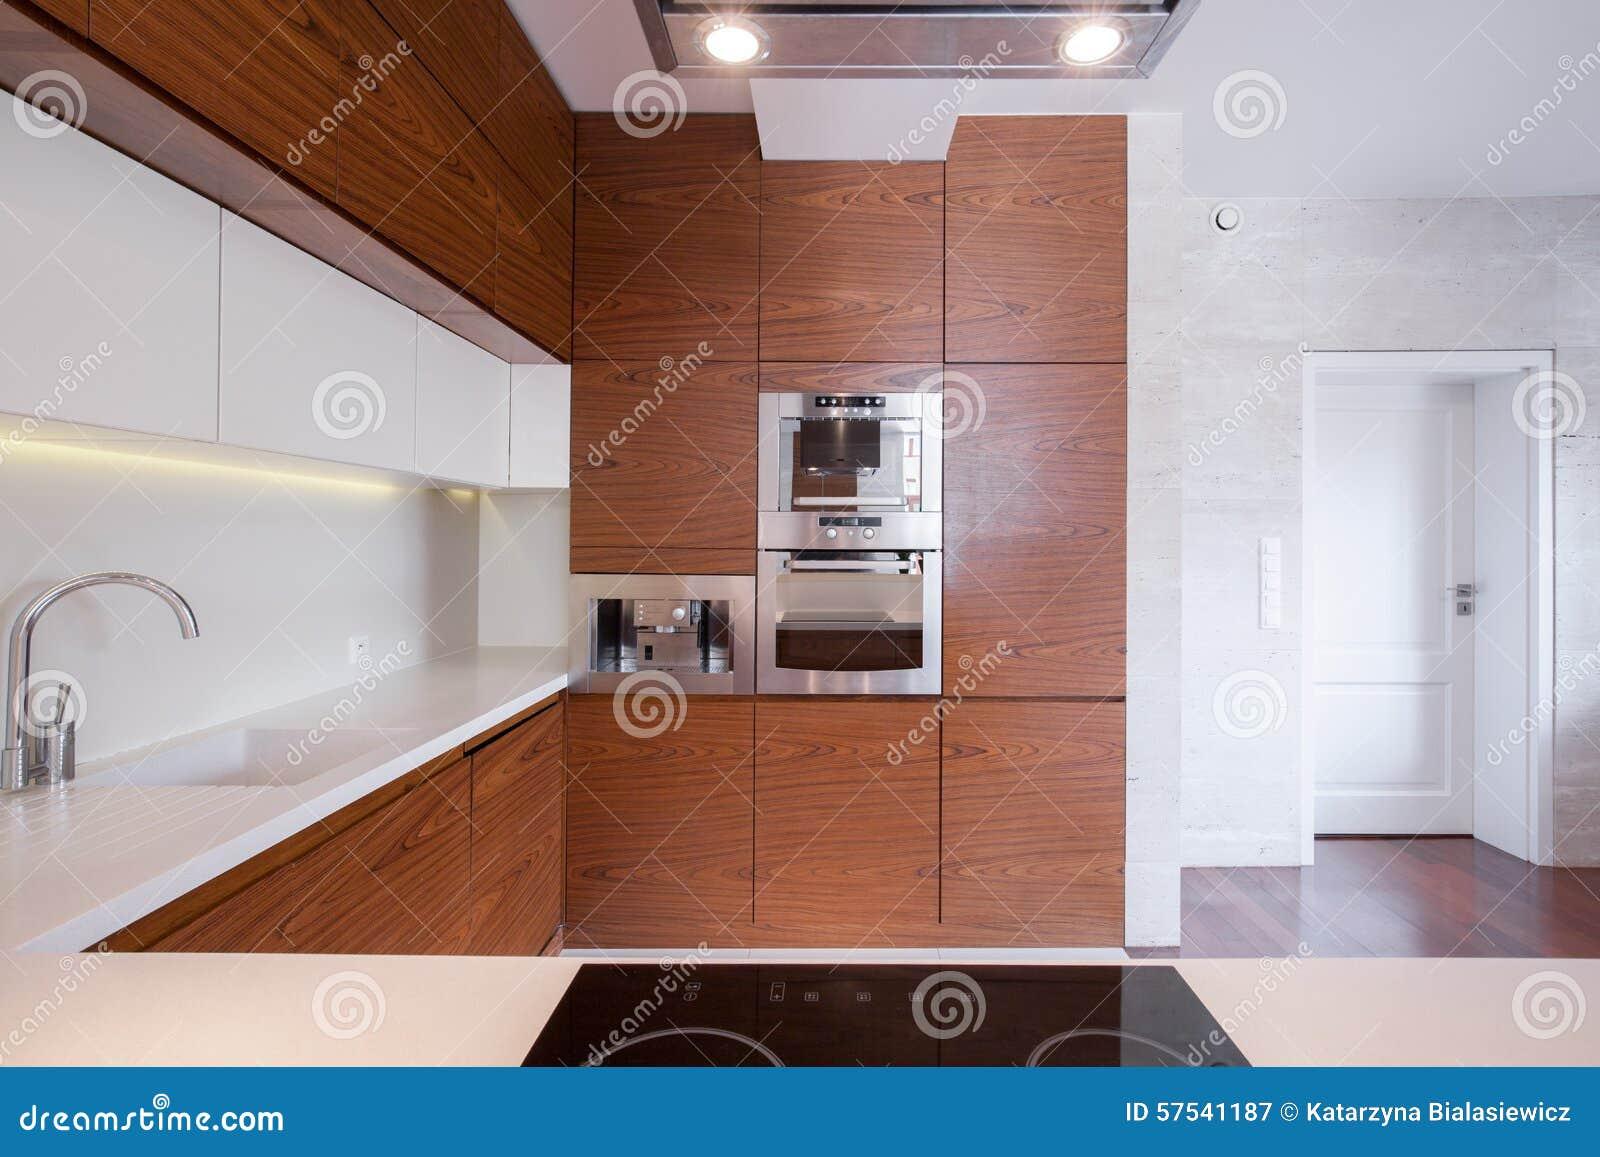 Cucina bianca e marrone spaziosa immagine stock immagine - Cucina bianca e marrone ...